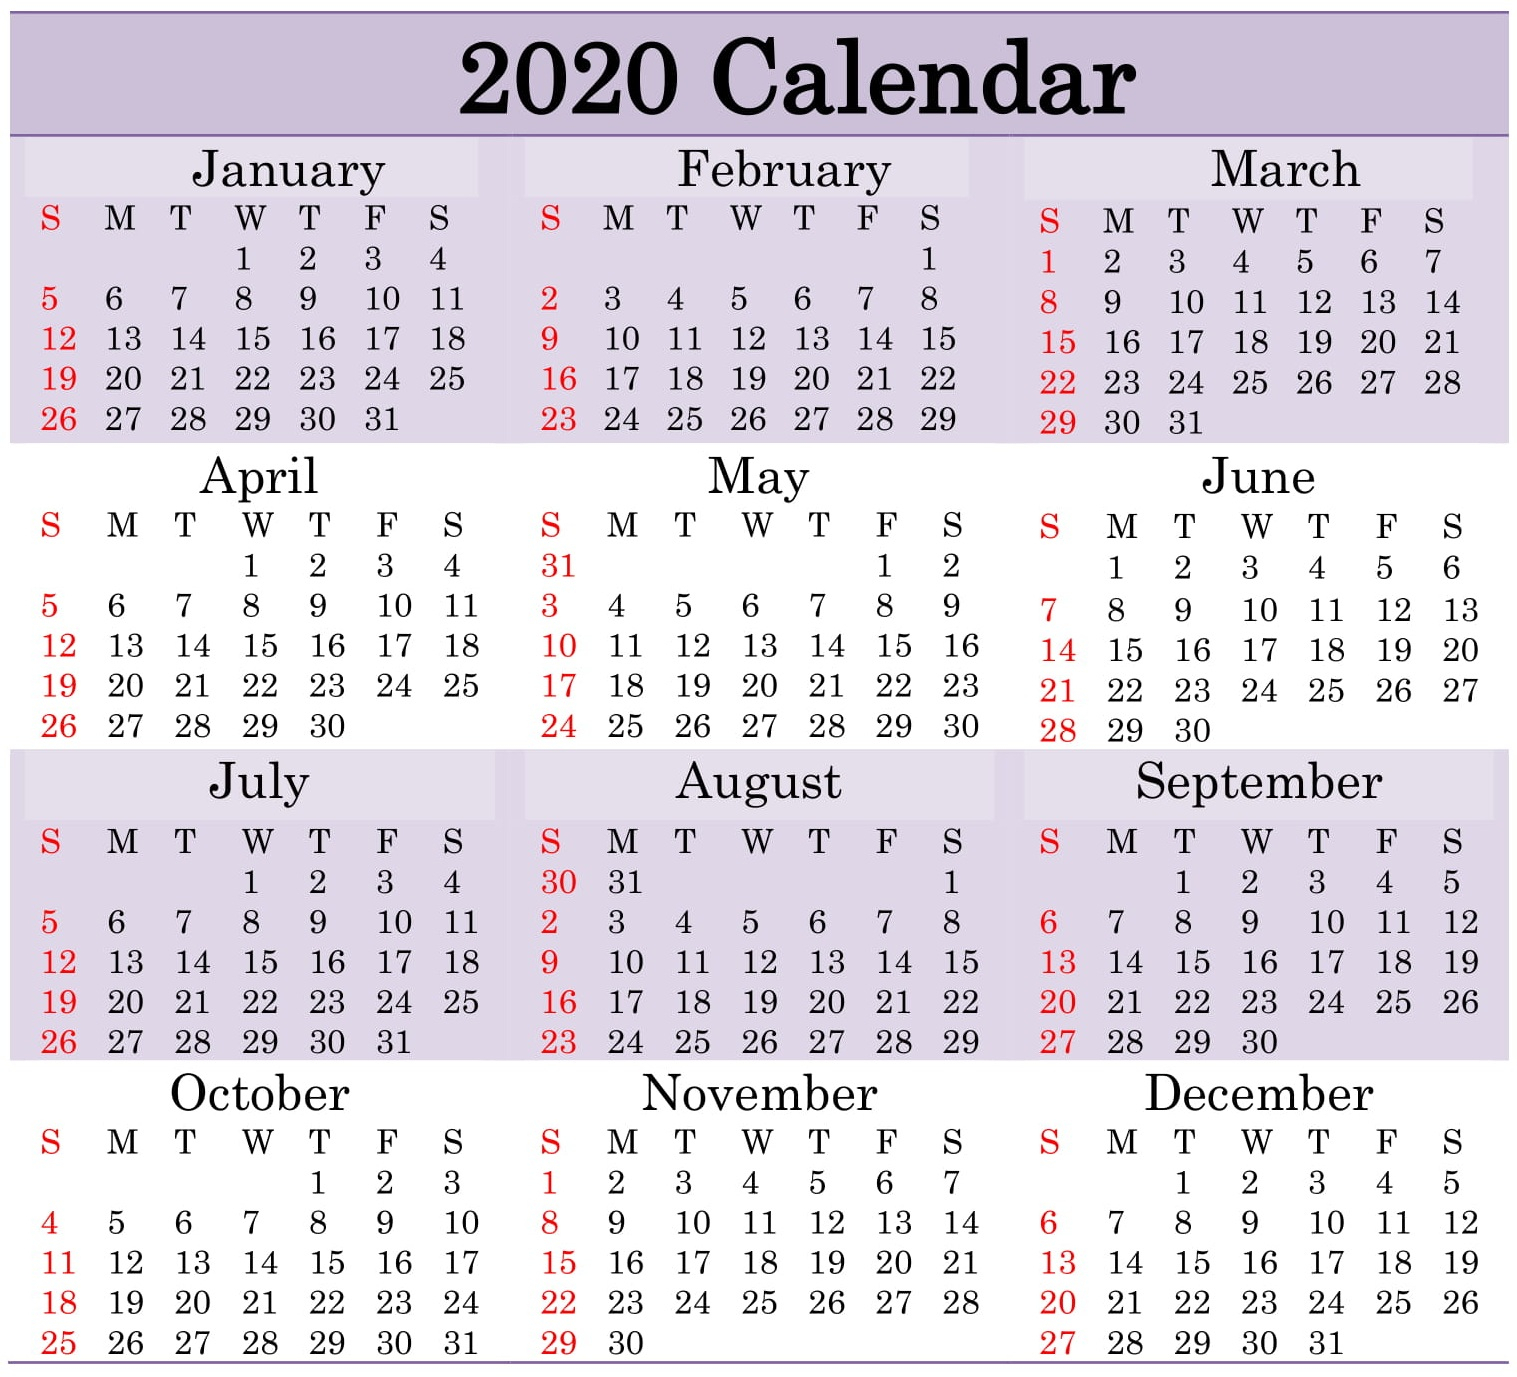 Printable 2020 Calendar Word Document - Latest Printable